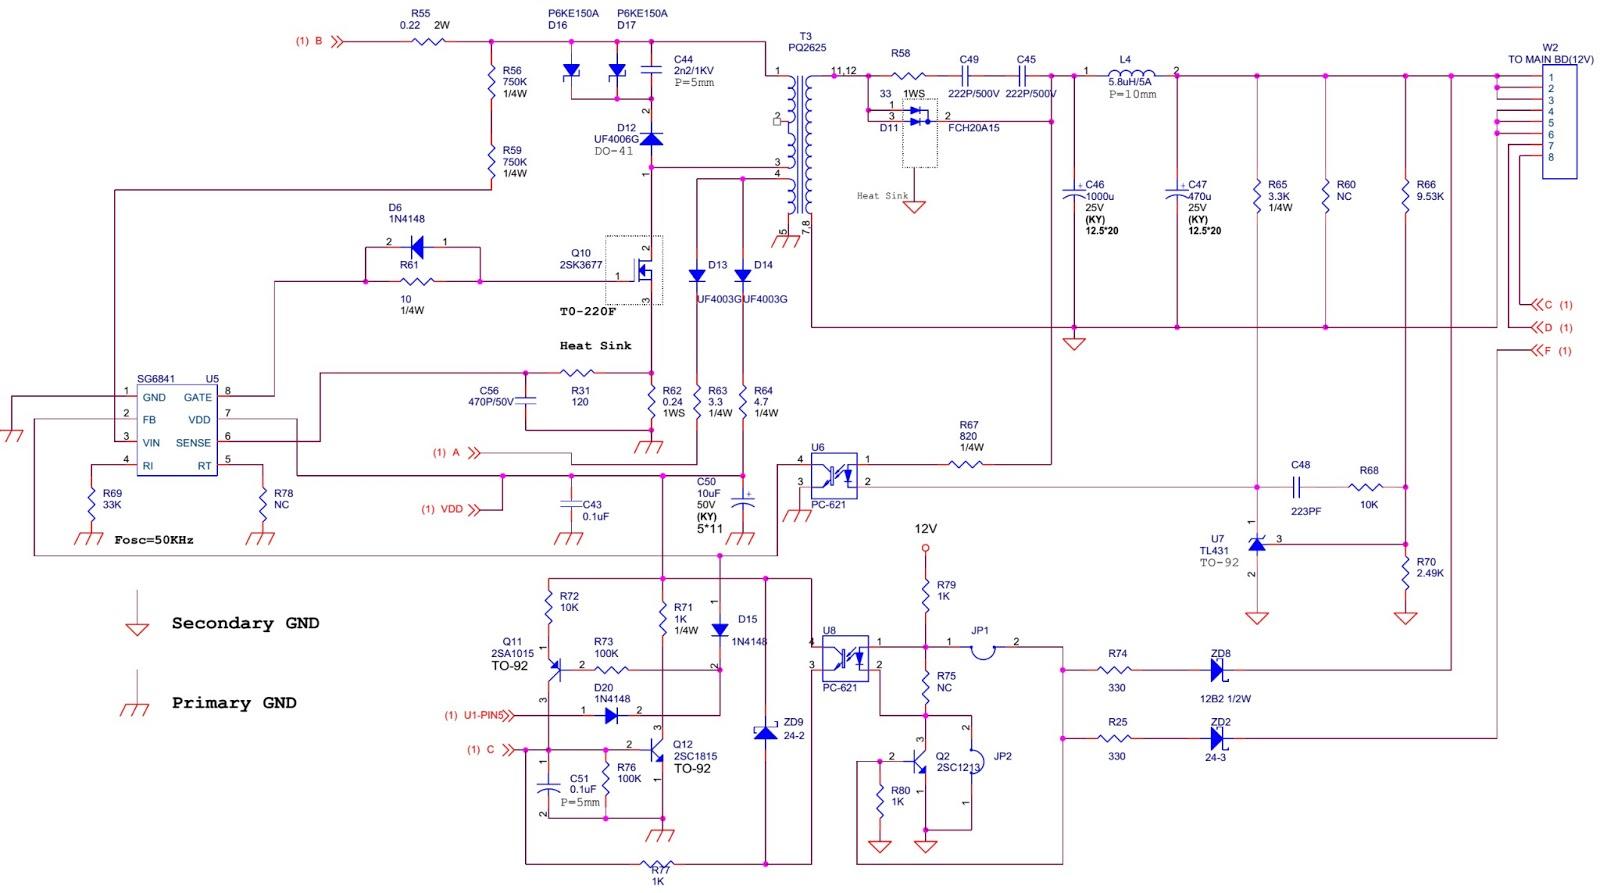 vizio l30wgu 30 lcd tv main power schematic circuit diagram vizio tv power supply schematic [ 1600 x 893 Pixel ]